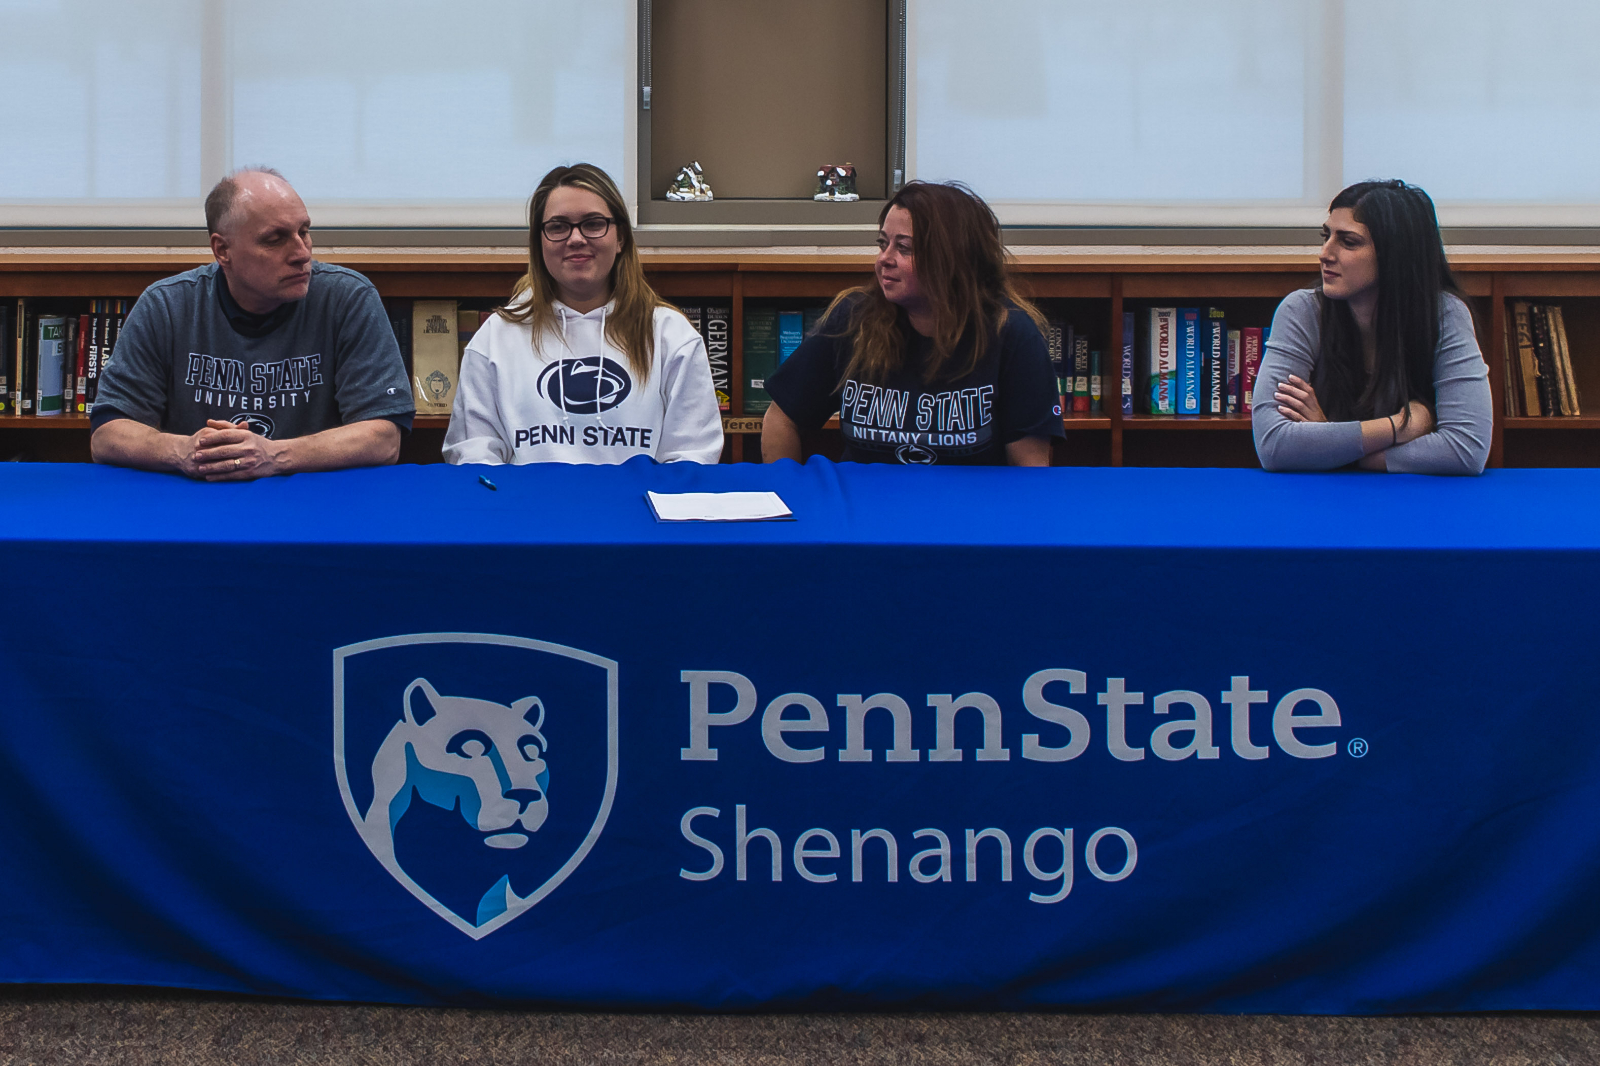 Jenna Bornemiss, headed to Penn State Shenango